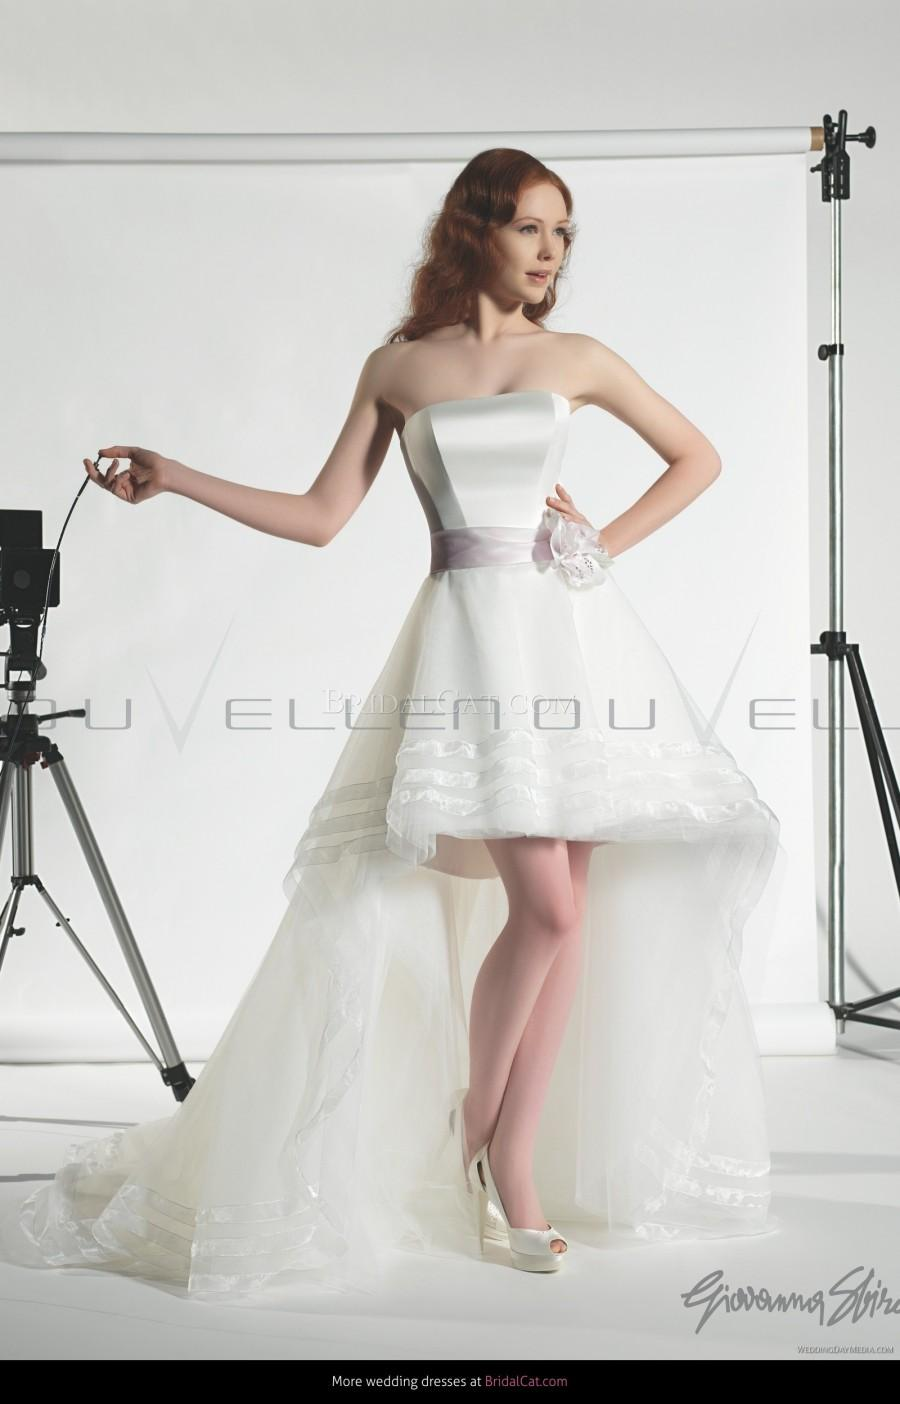 Свадьба - Giovanna Sbiroli Nouvelle 95213 - Fantastische Brautkleider